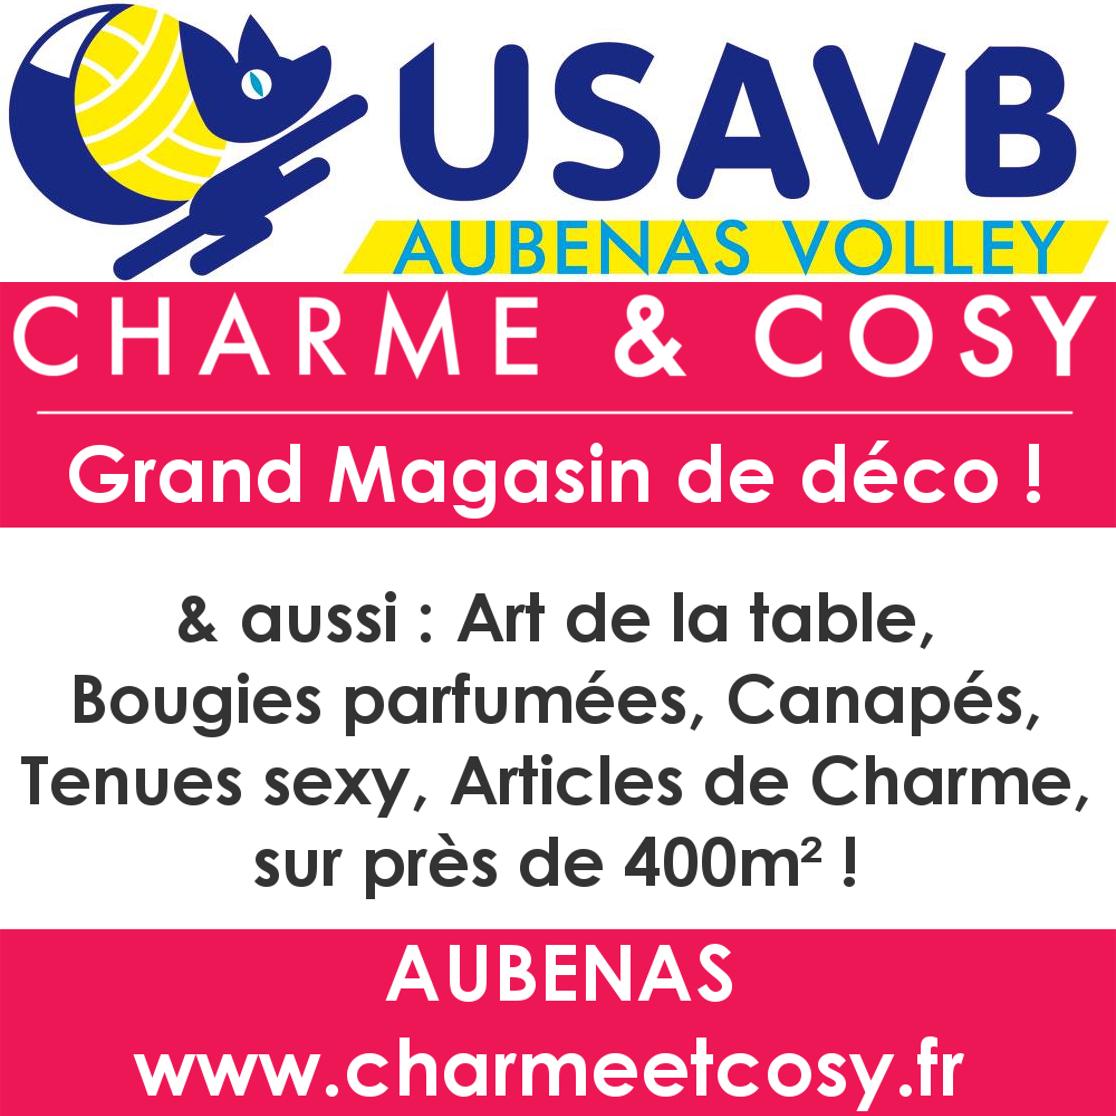 charme-et-cosy-aubenas-sponsor-volley